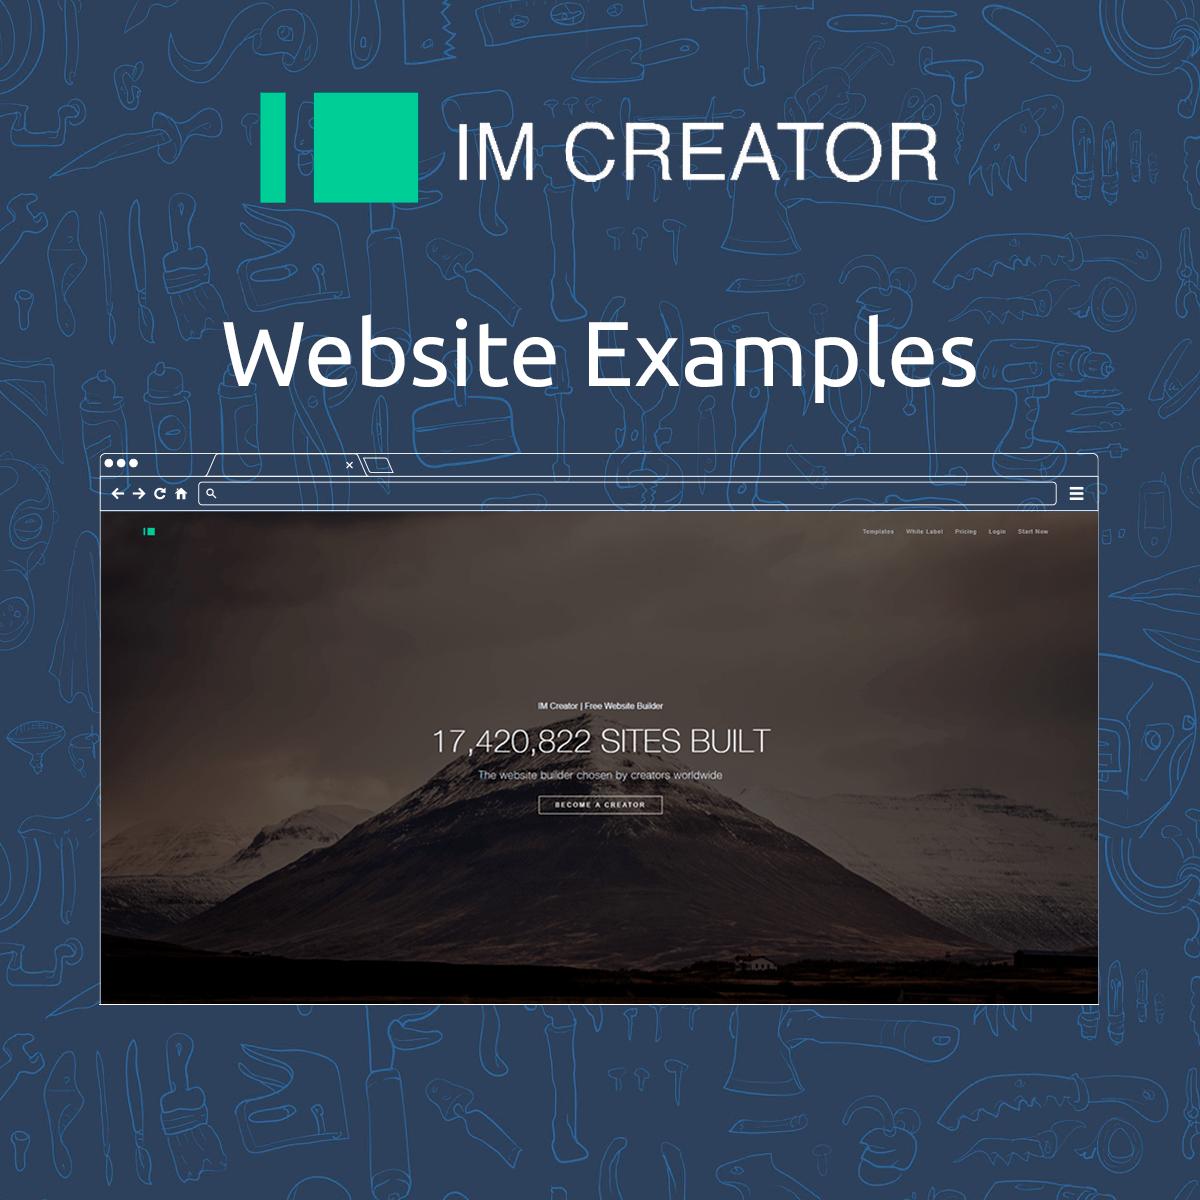 IMCreator Website Examples